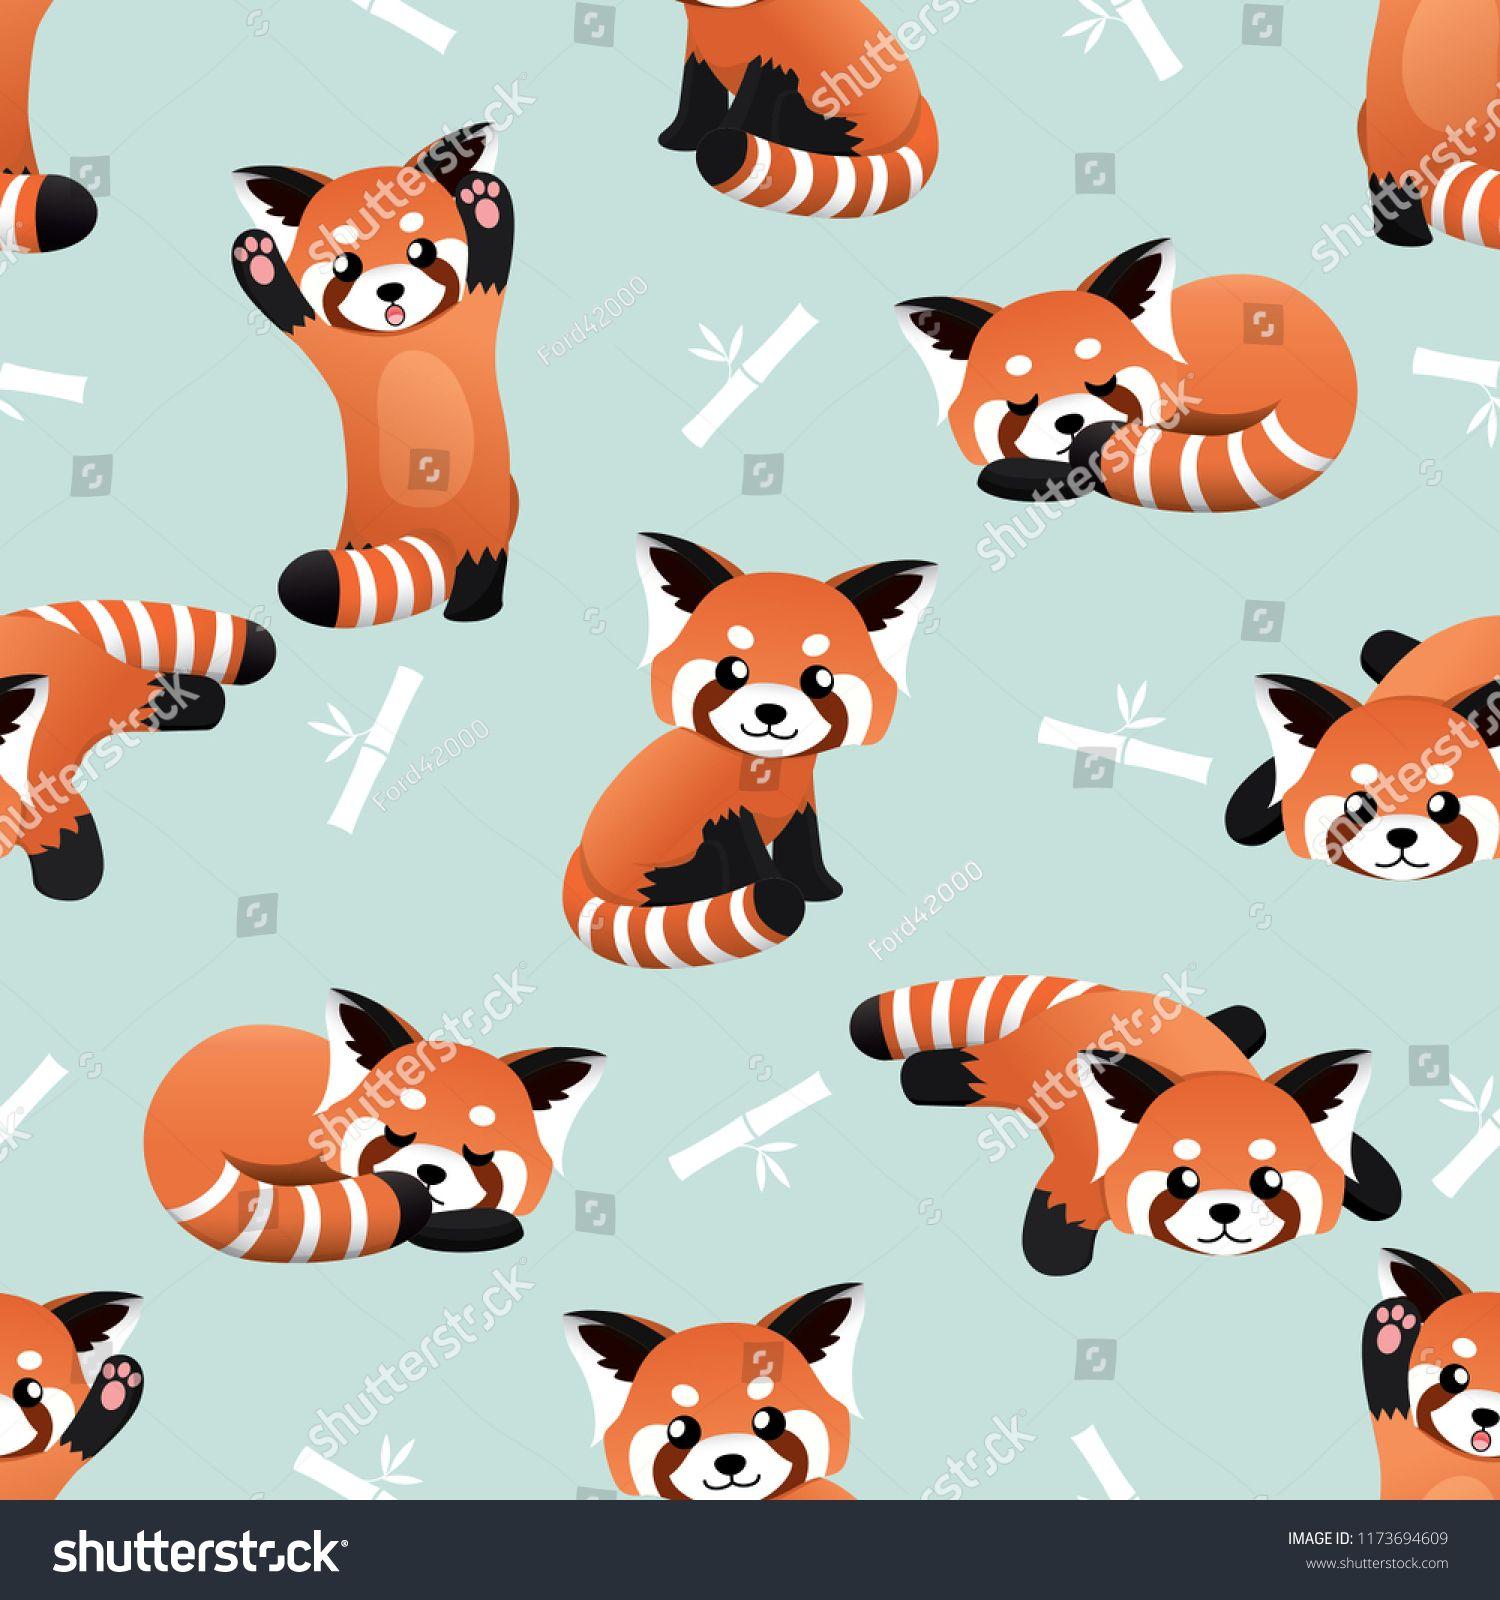 Seamless Cute Red Panda And Bamboo Vector Pattern Background Cute Animal Pattern Red Panda Seamless Cute Red Panda Background Patterns Stuffed Animal Patterns